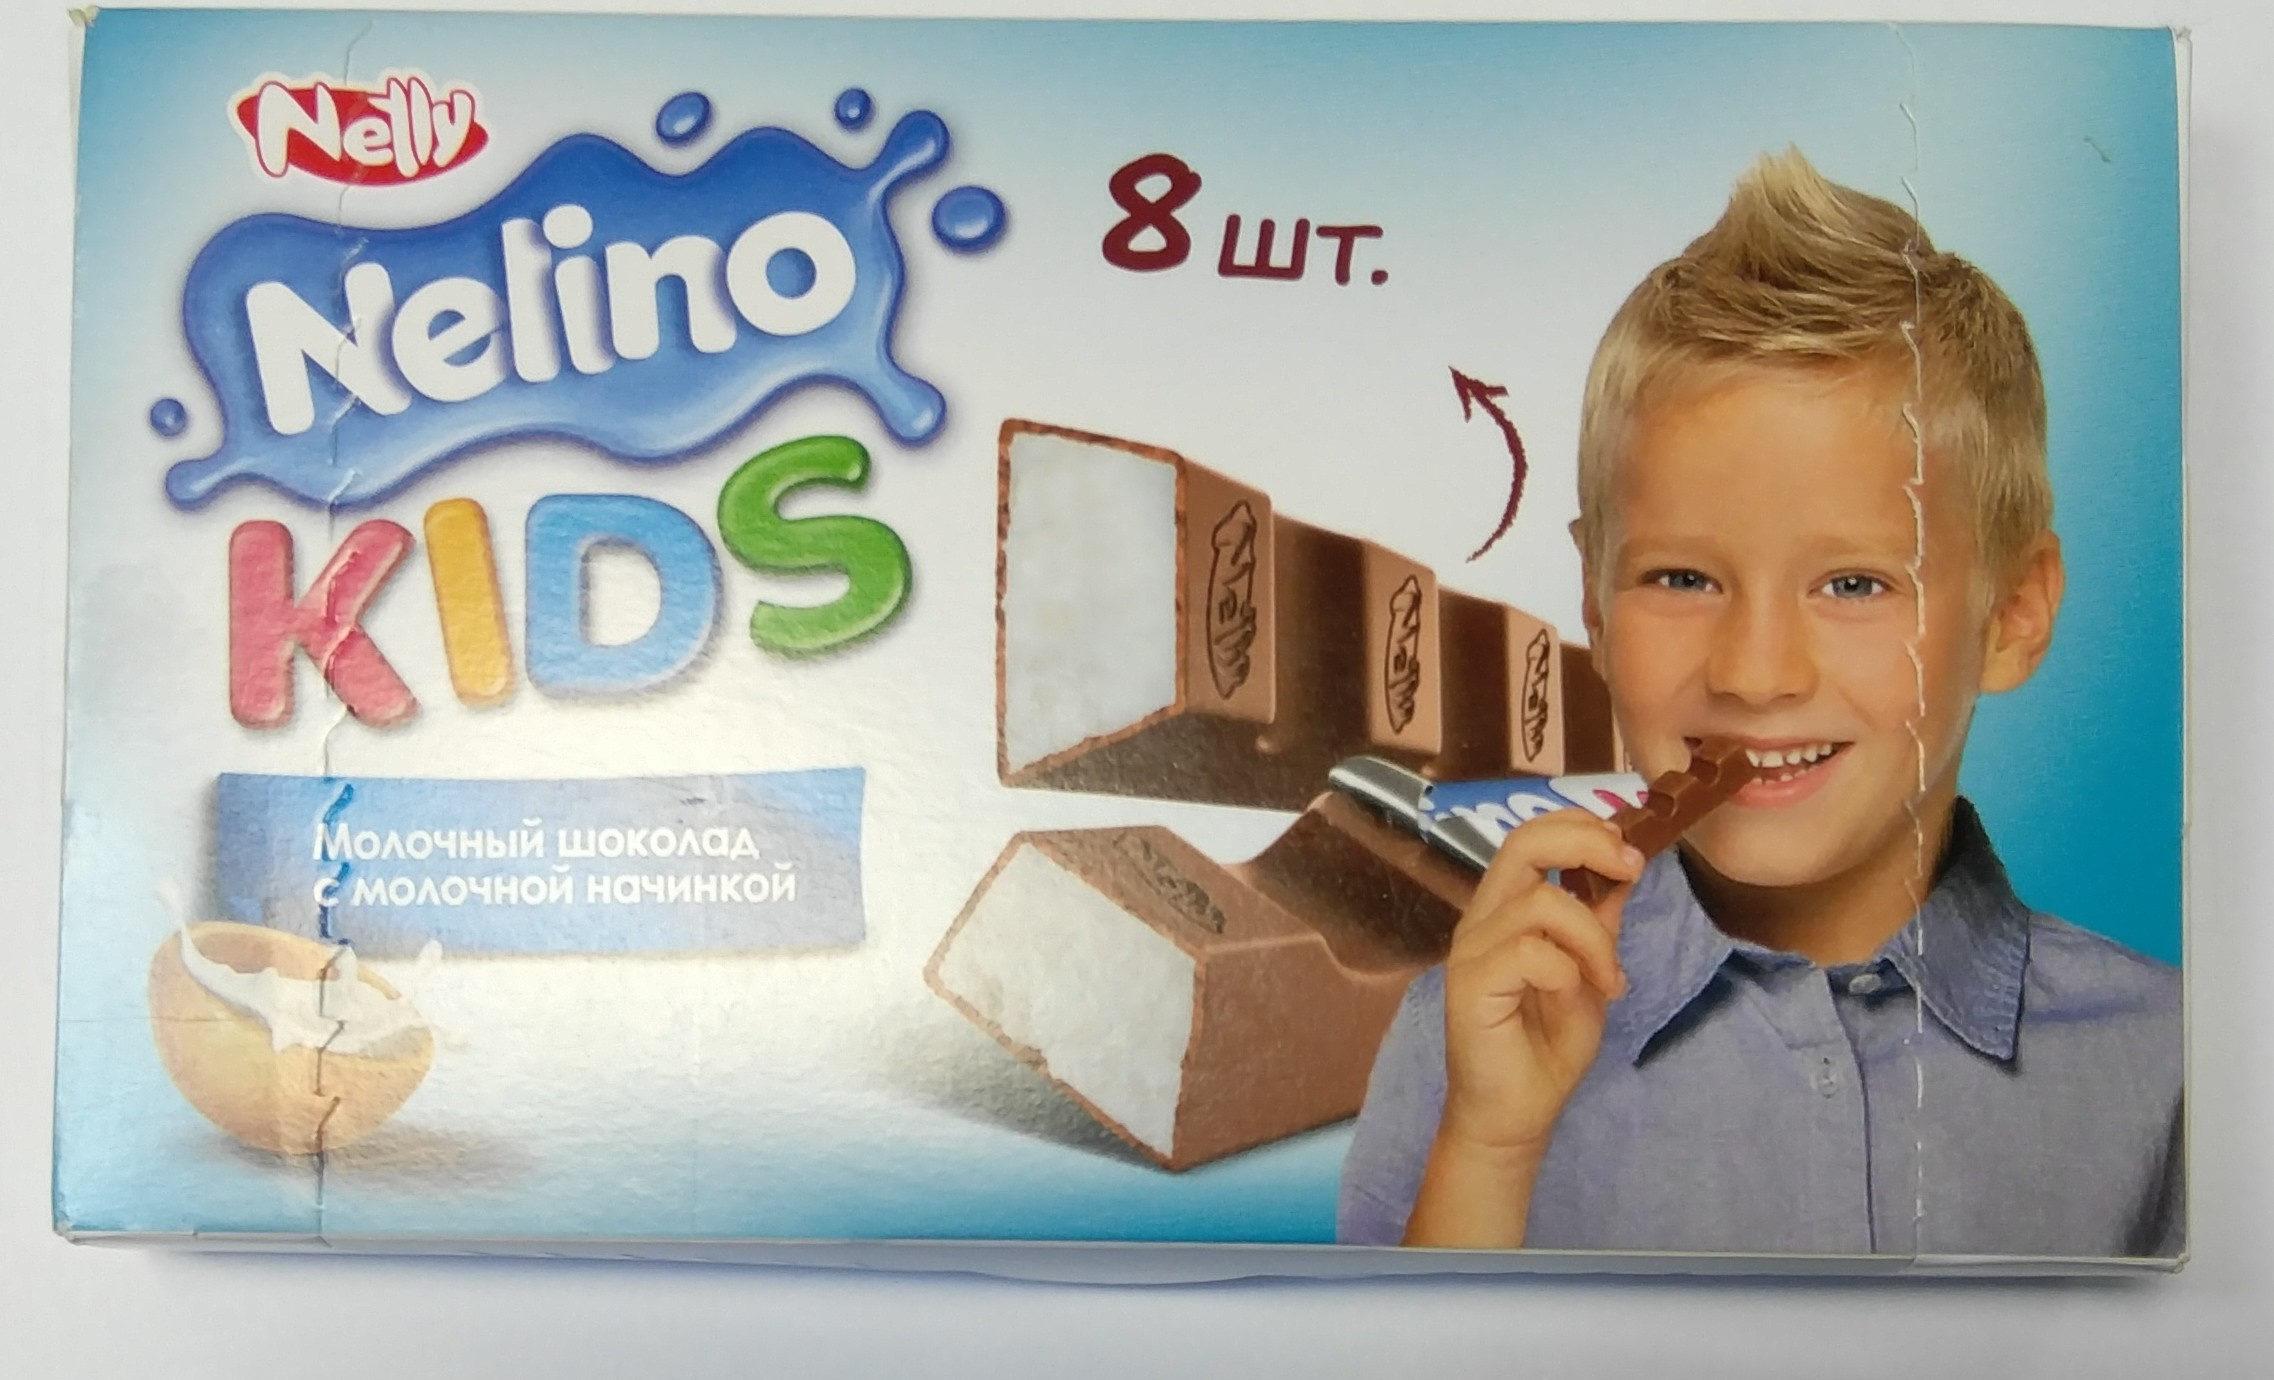 Nelino kids - Produit